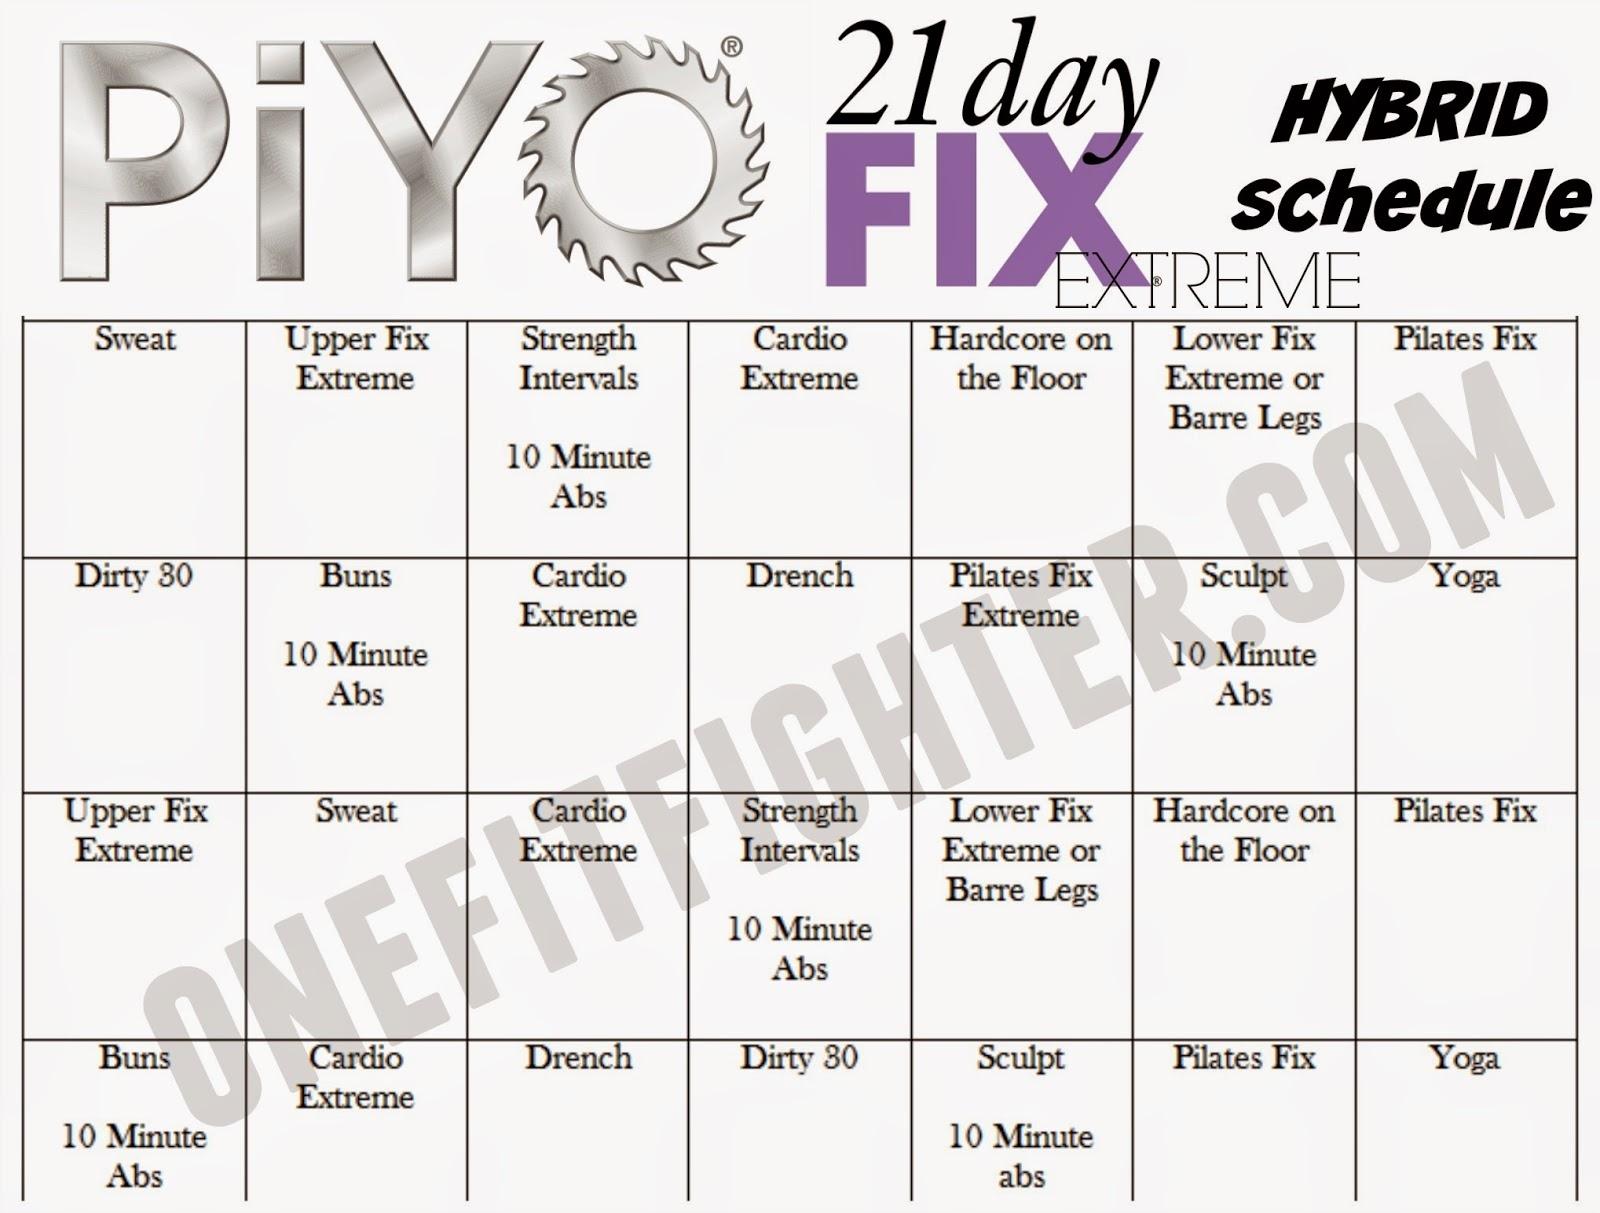 Piyo/ 21Day Fix Hybrid Week One - Katy Ursta with regard to Insanity Max 30/piyo Hybrid Calendar